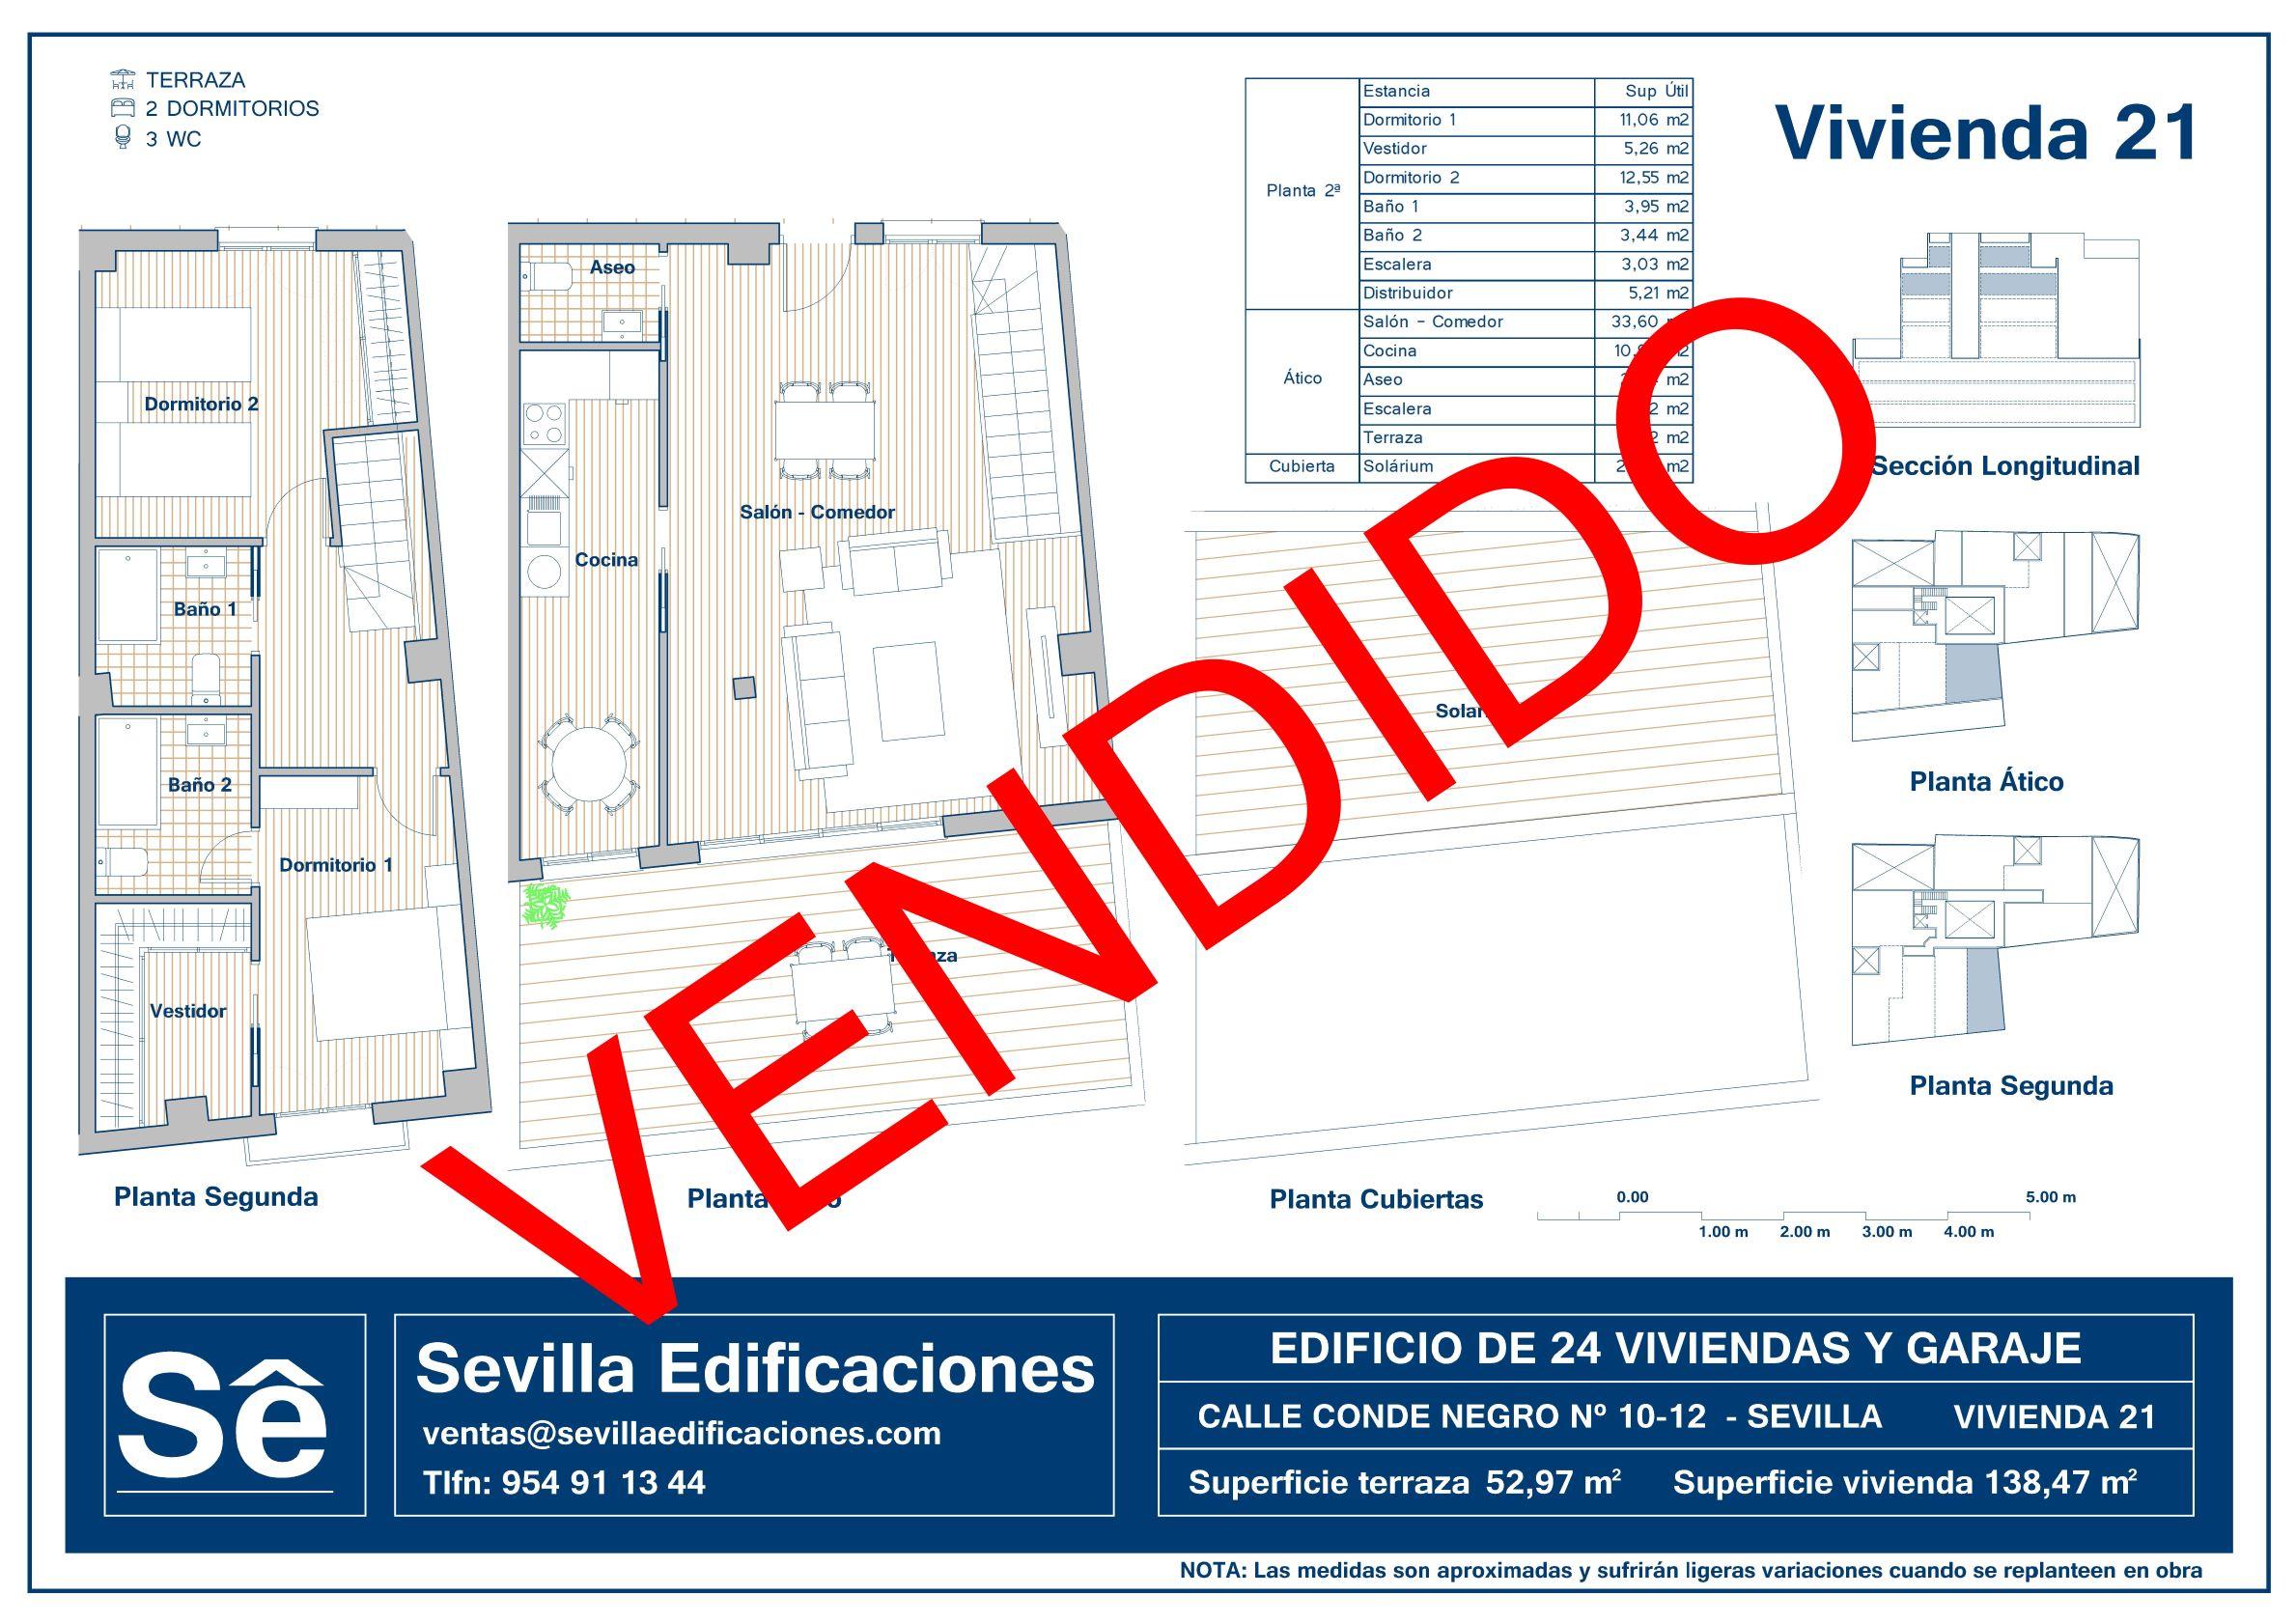 CONDENEGRO_VIVIENDA_21_VENDIDO